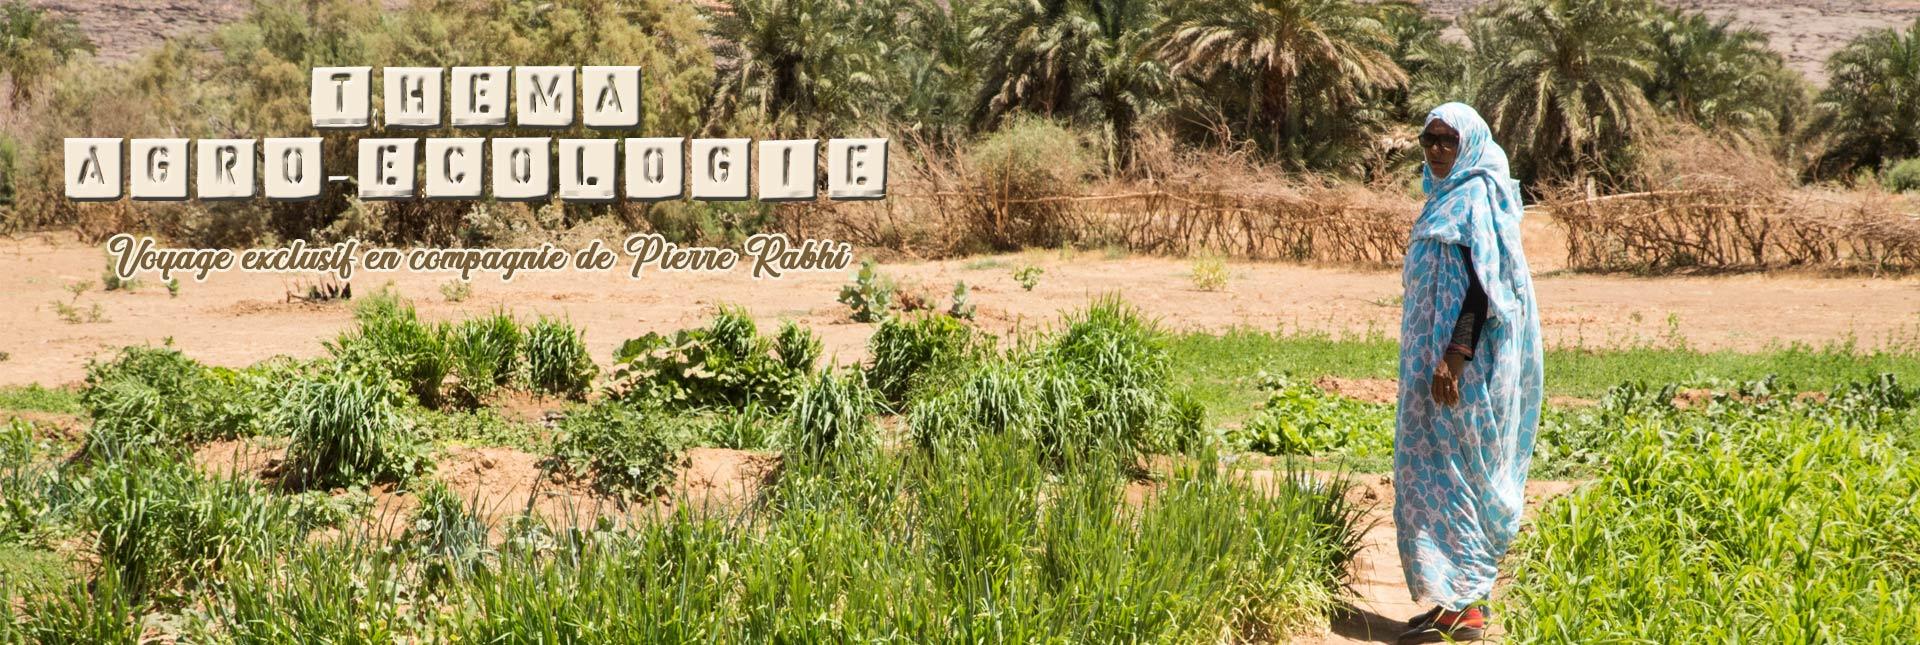 Théma agroécologie à Maaden avec Pierre Rabhi